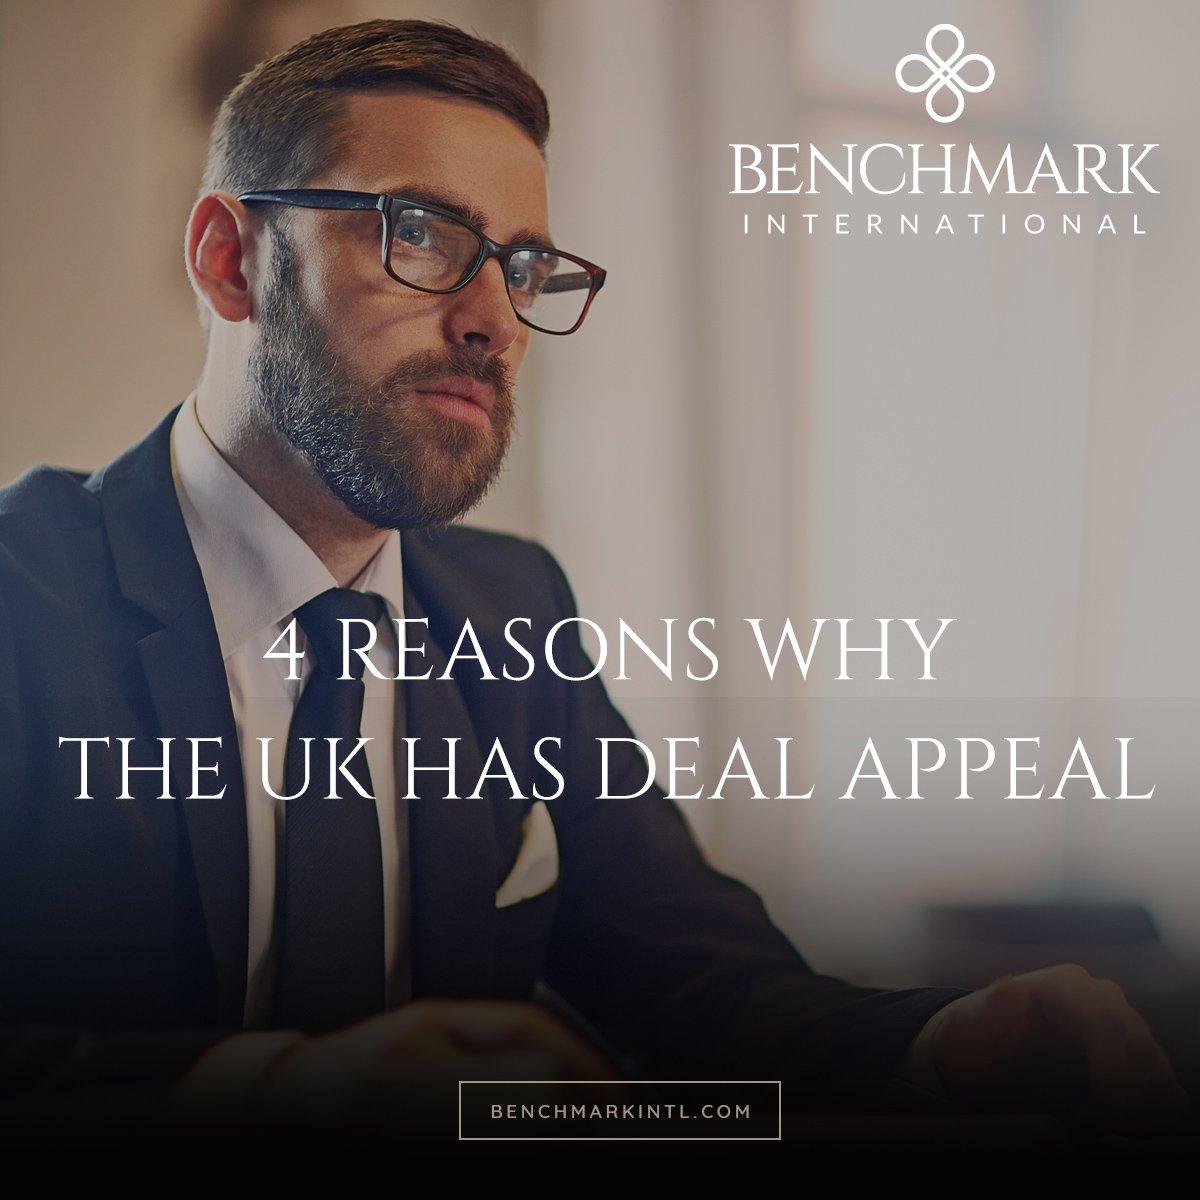 UK Deal Appeal